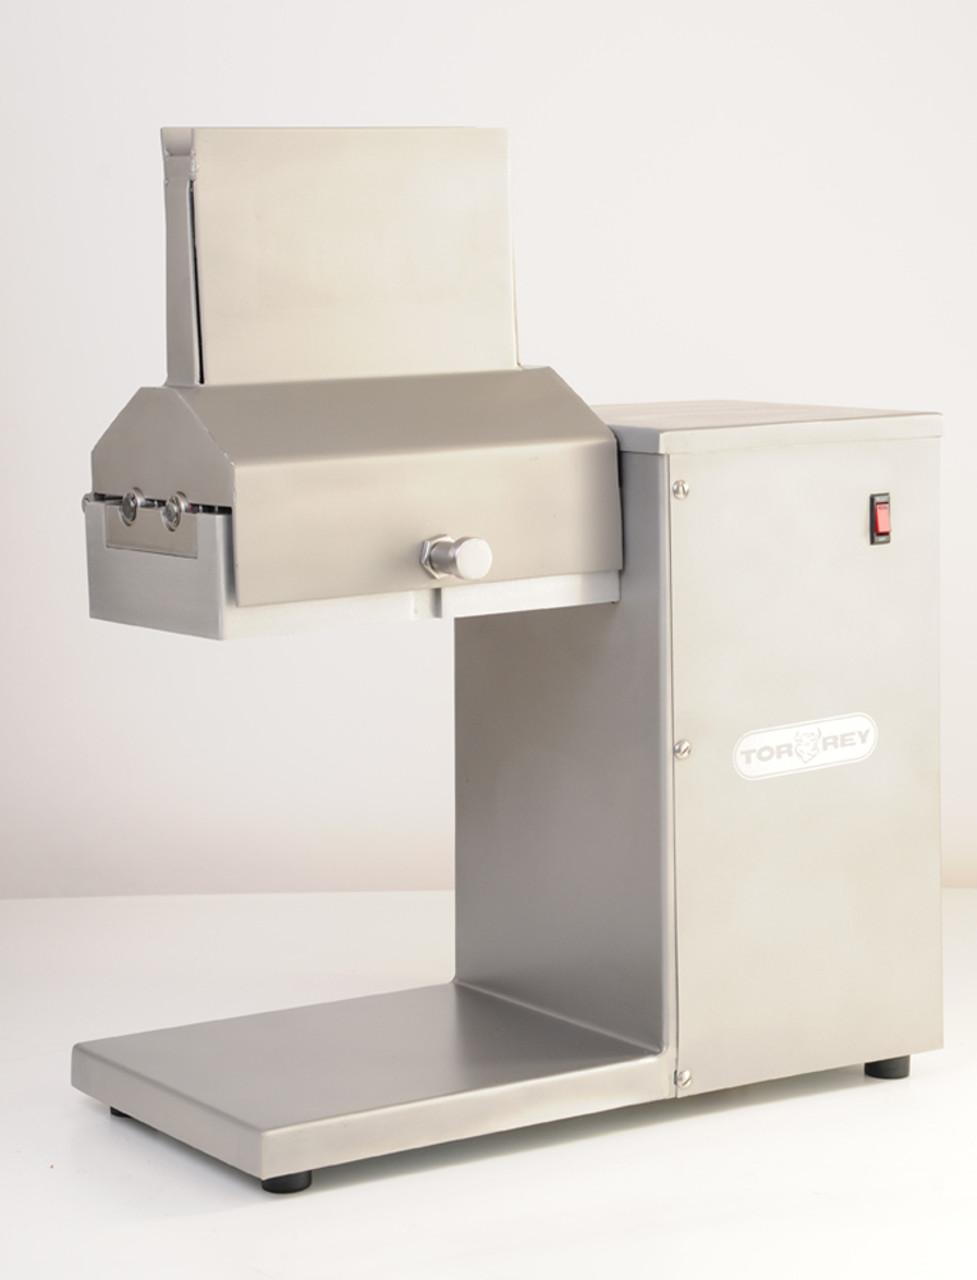 TorRey Model MT-43 Meat Tenderizer